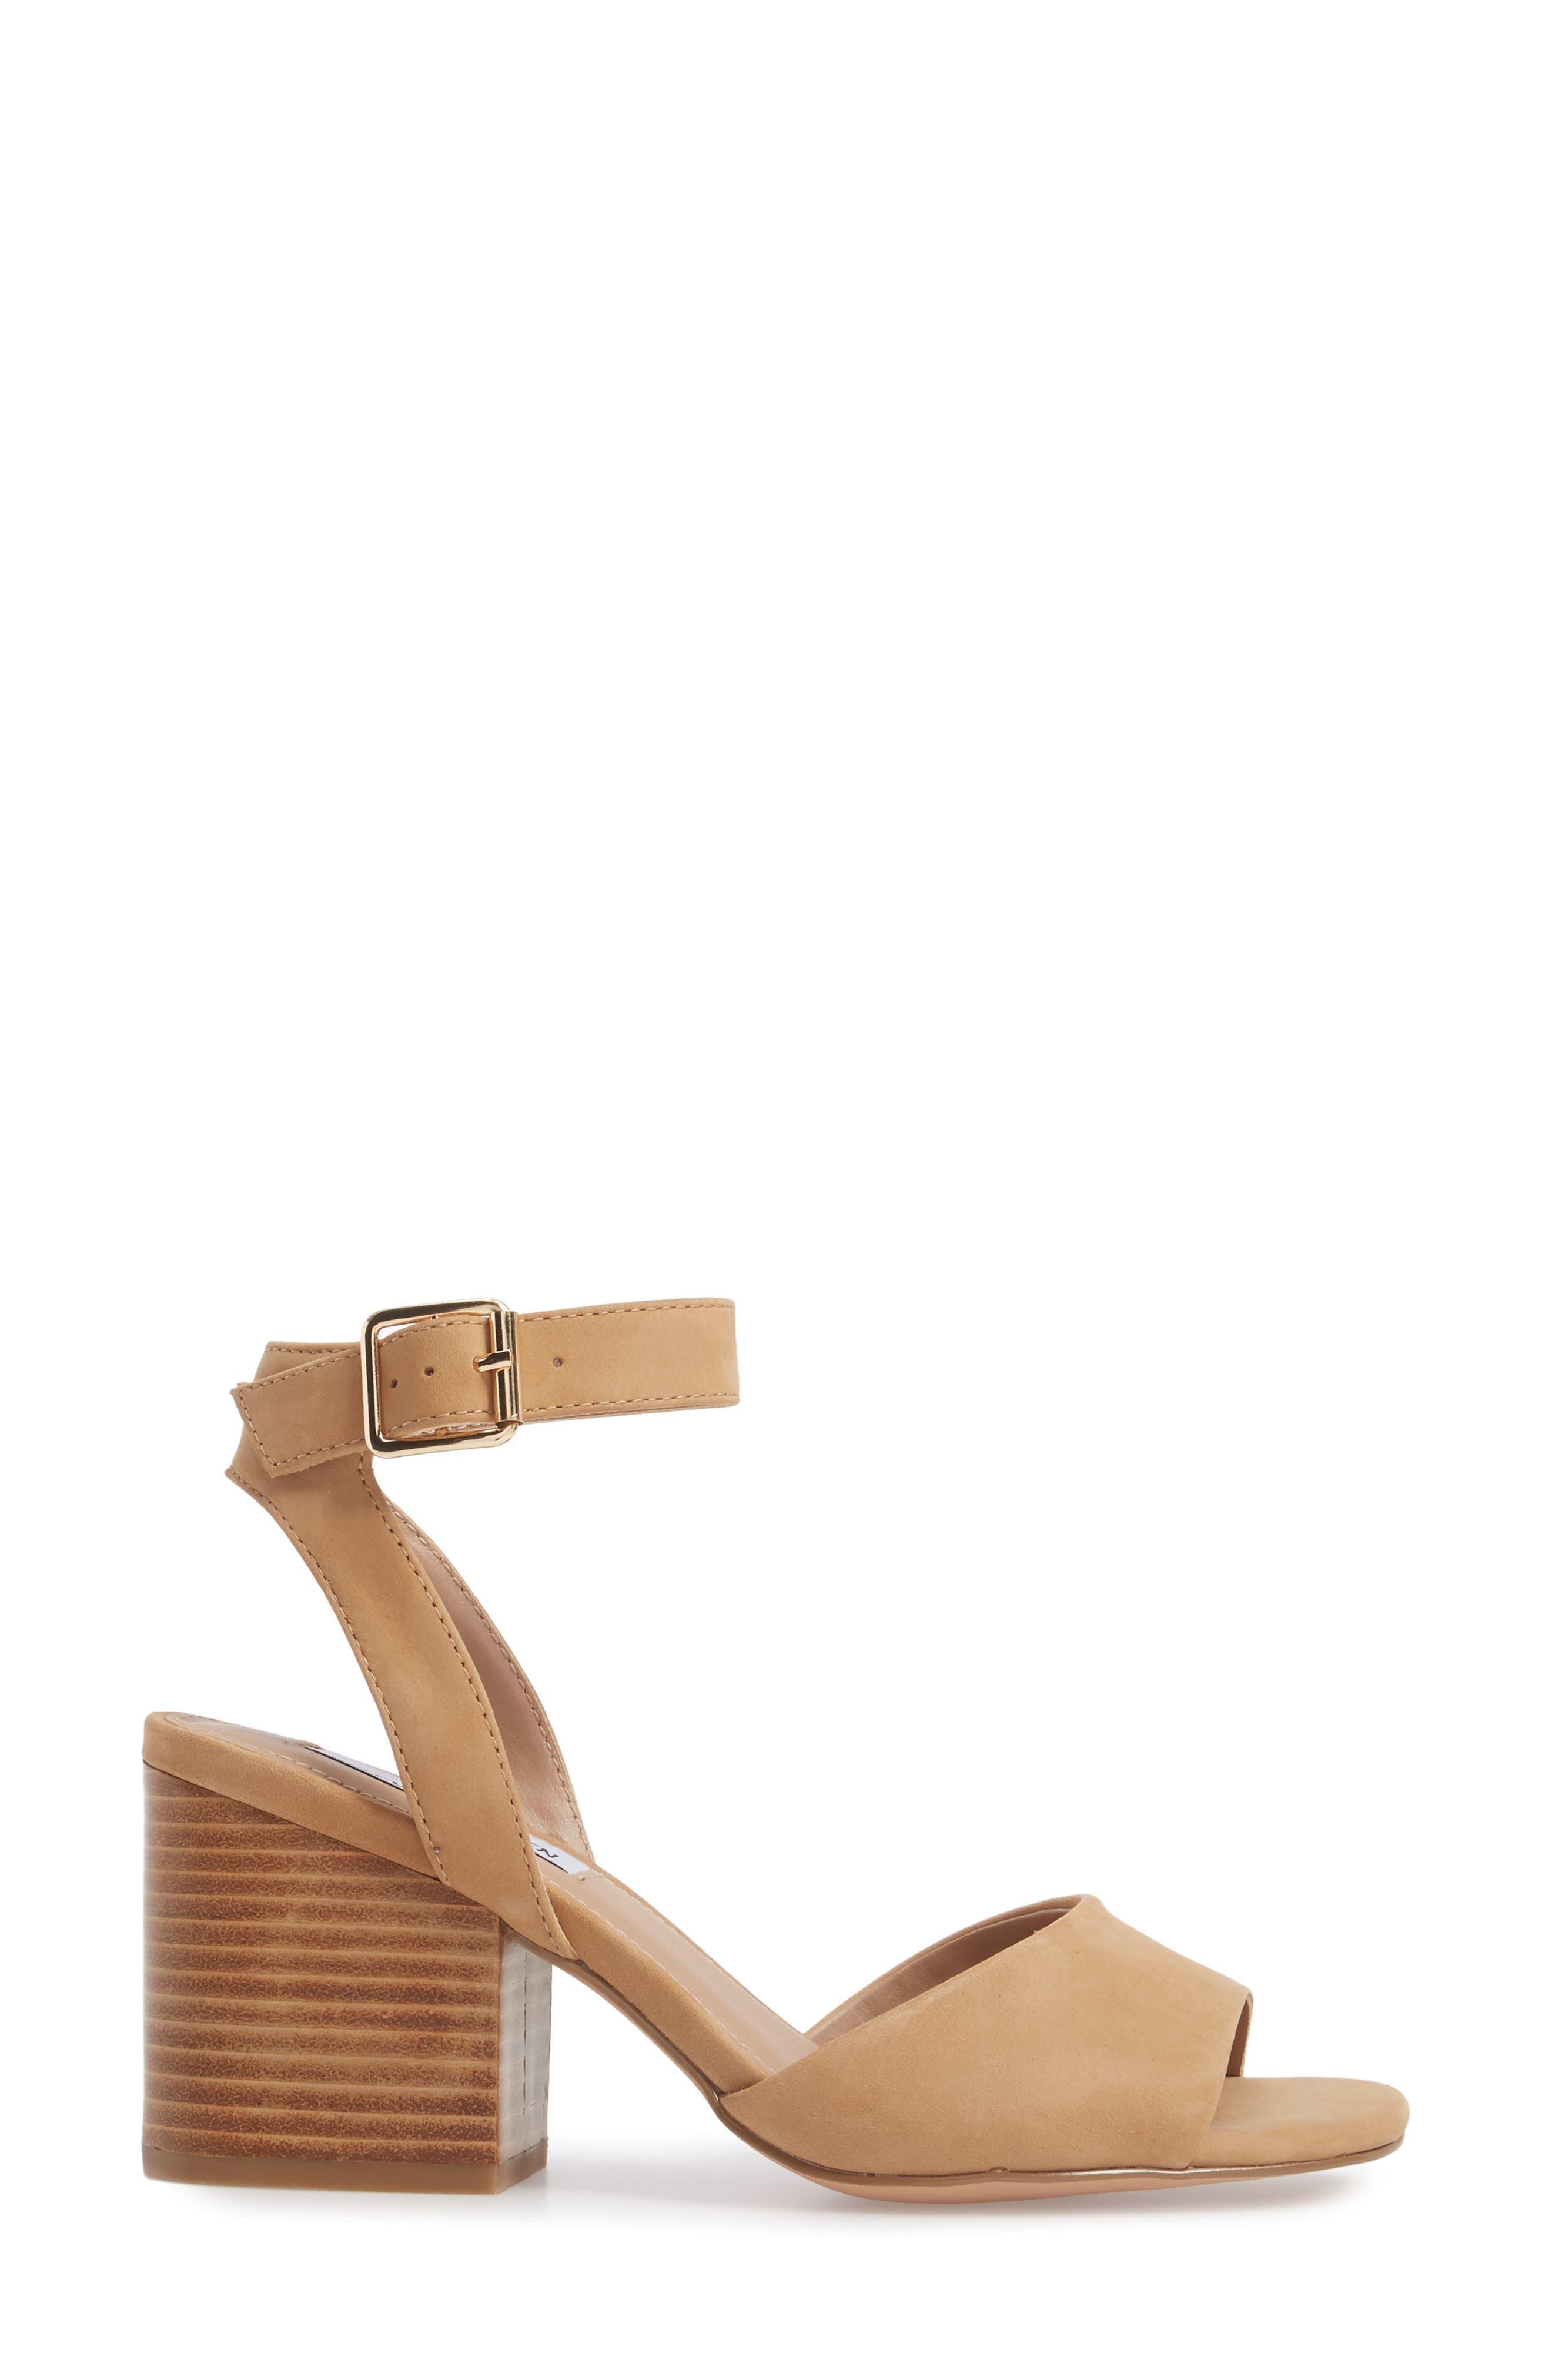 Devlin Block Heel Sandal,                             Alternate thumbnail 3, color,                             200